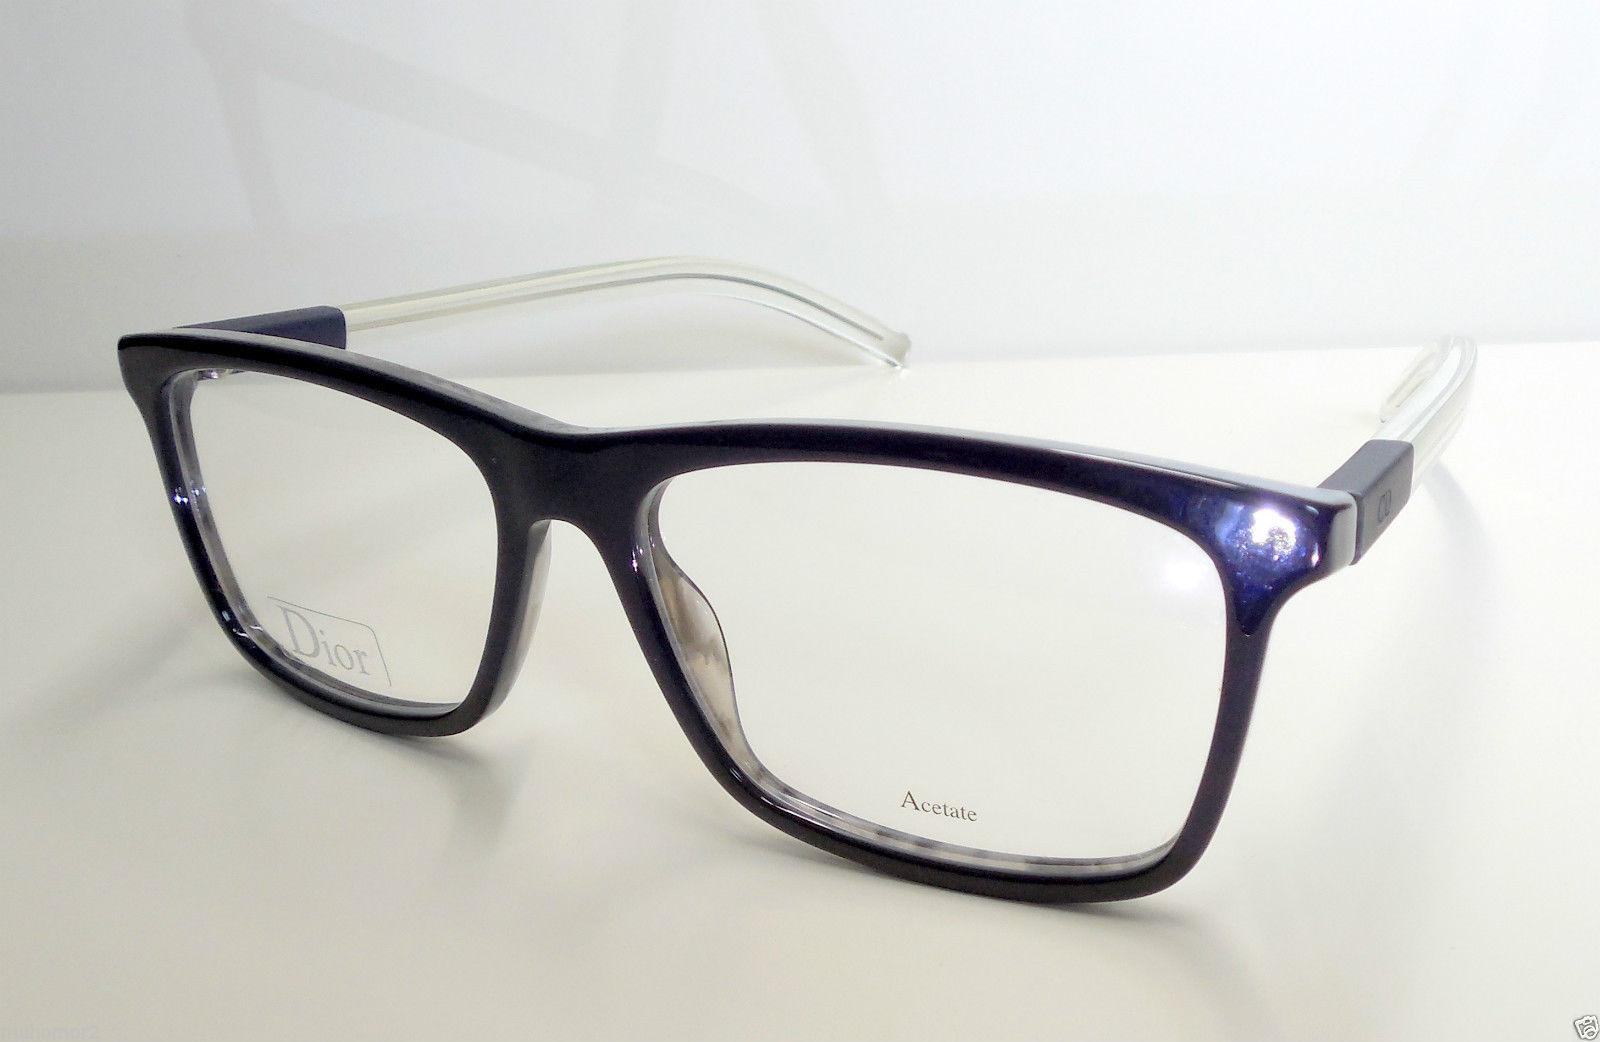 Neu Dior Homme Black Tie 215 Lmx 145 Optyl and 50 similar items